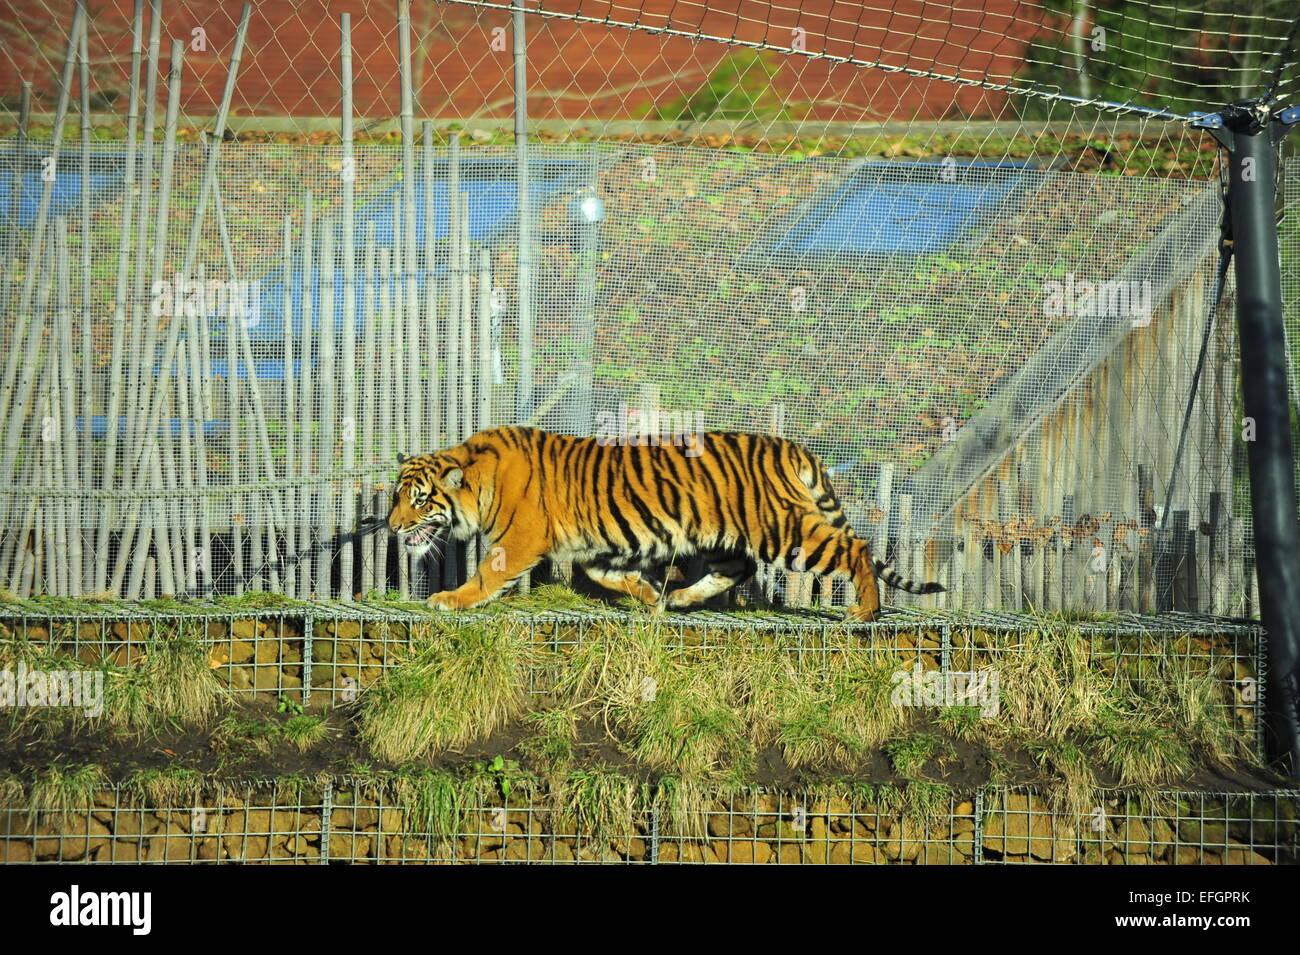 ZSL, London Zoo, UK. 4th February, 2015. One year old Sumatran tiger triplets Nakal, Budi and Cinta wake up to specially - Stock Image